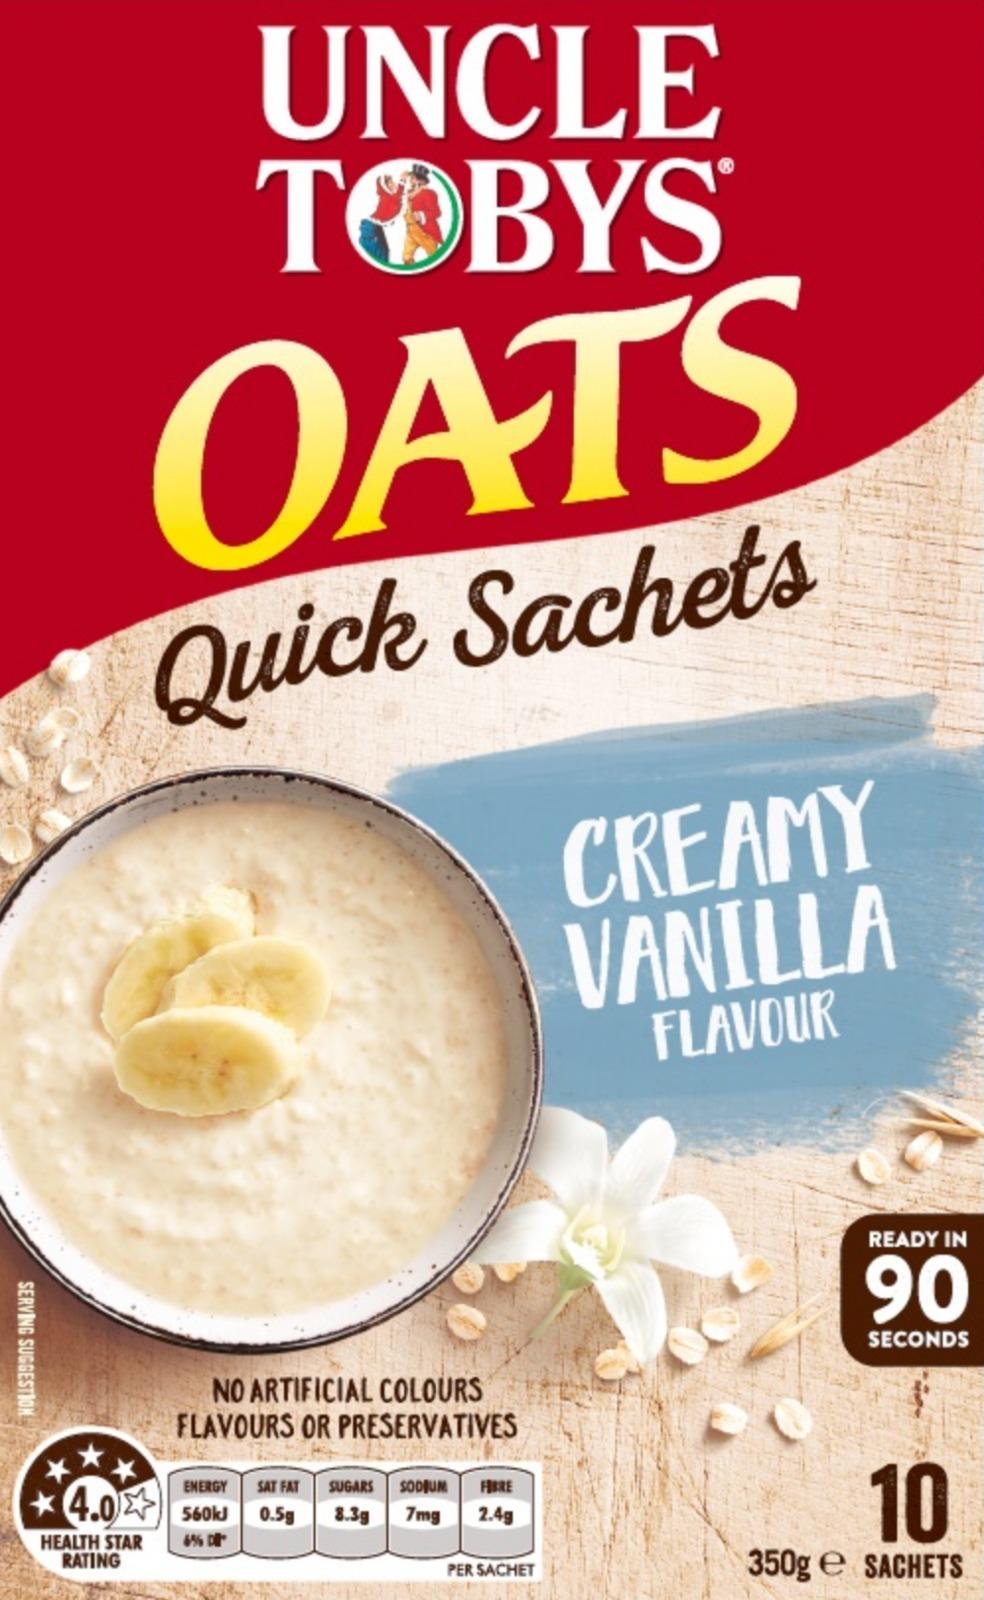 Uncle Tobys Oats (Creamy Vanilla, 350g) 5pk image